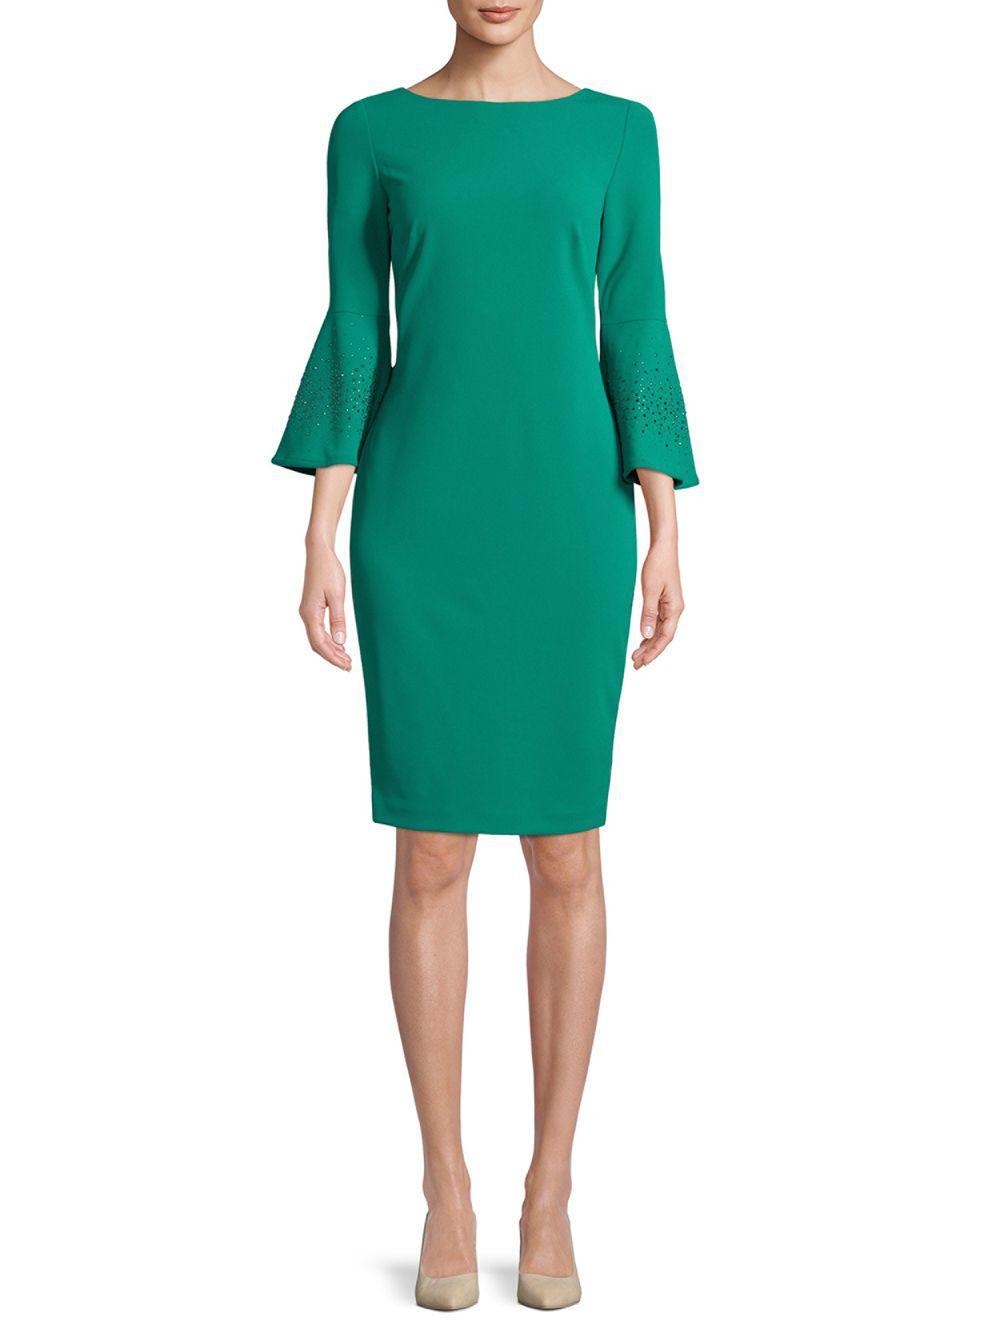 Lyst - Calvin Klein 205W39Nyc Bell Sleeve Sheath Dress in Green